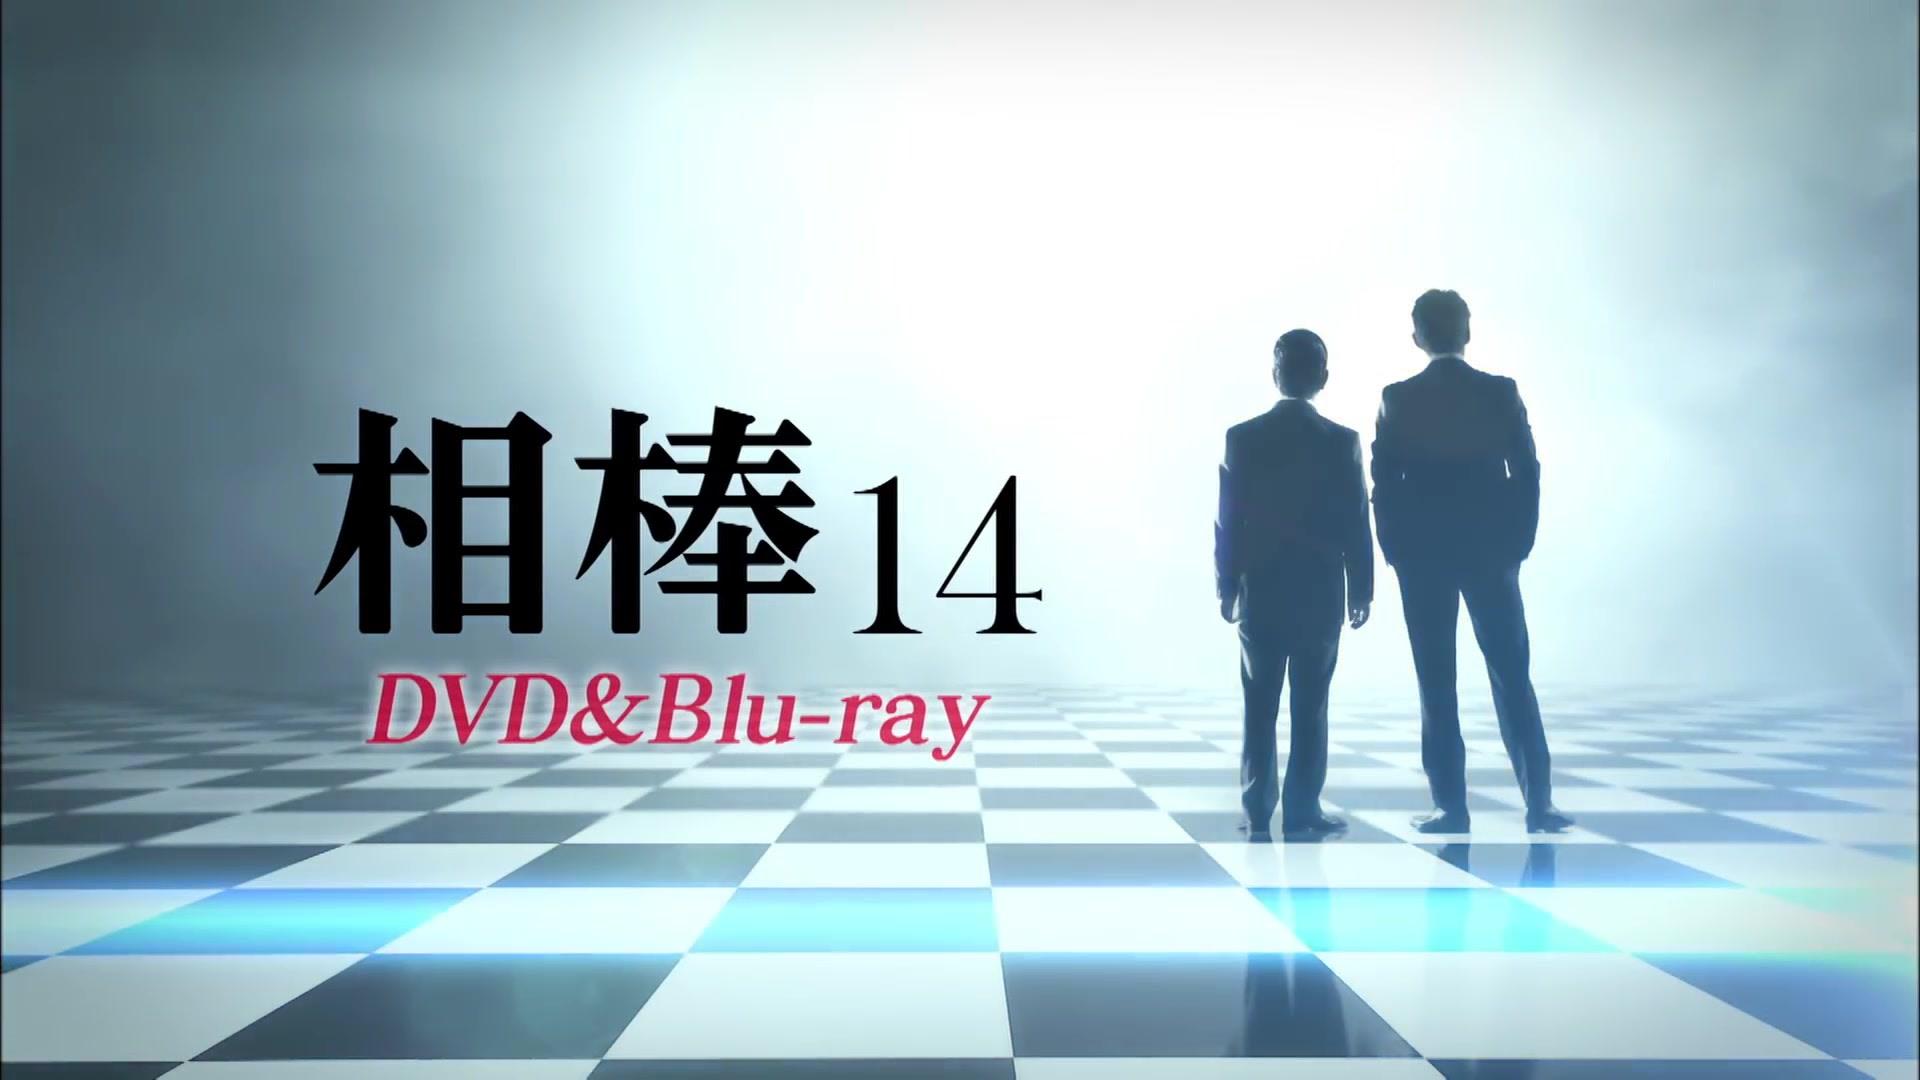 相棒season 14 Dvd发售预告 哔哩哔哩 つロ干杯 Bilibili